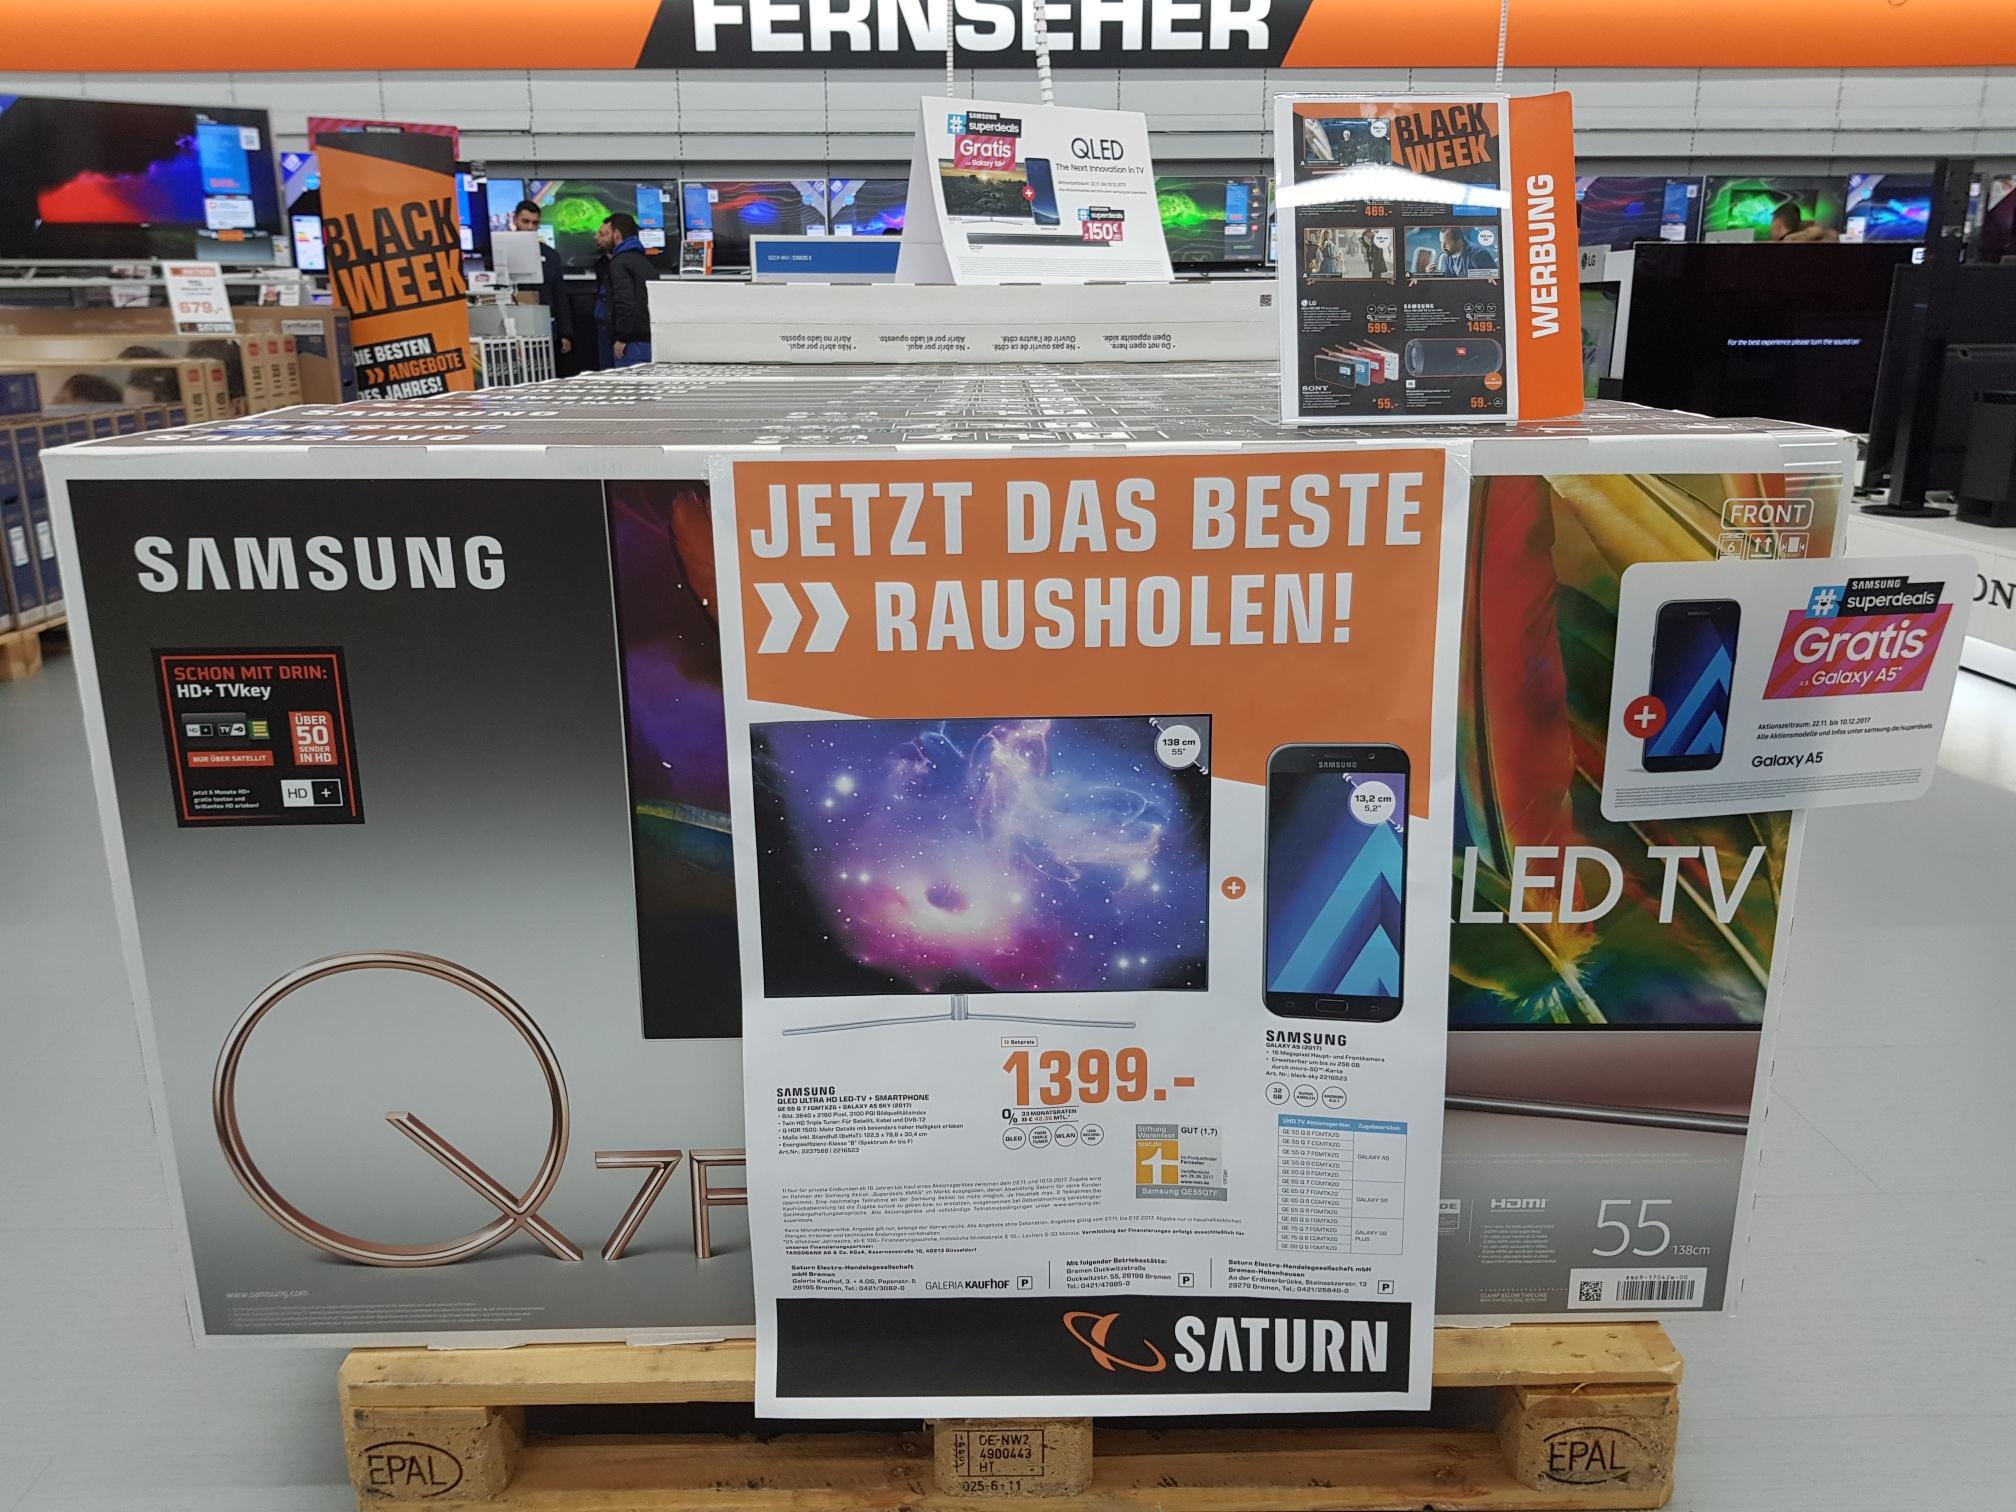 Region Bremen Samsung 55Zoll TV QE55Q7F inkl. Samsung Galaxy A5